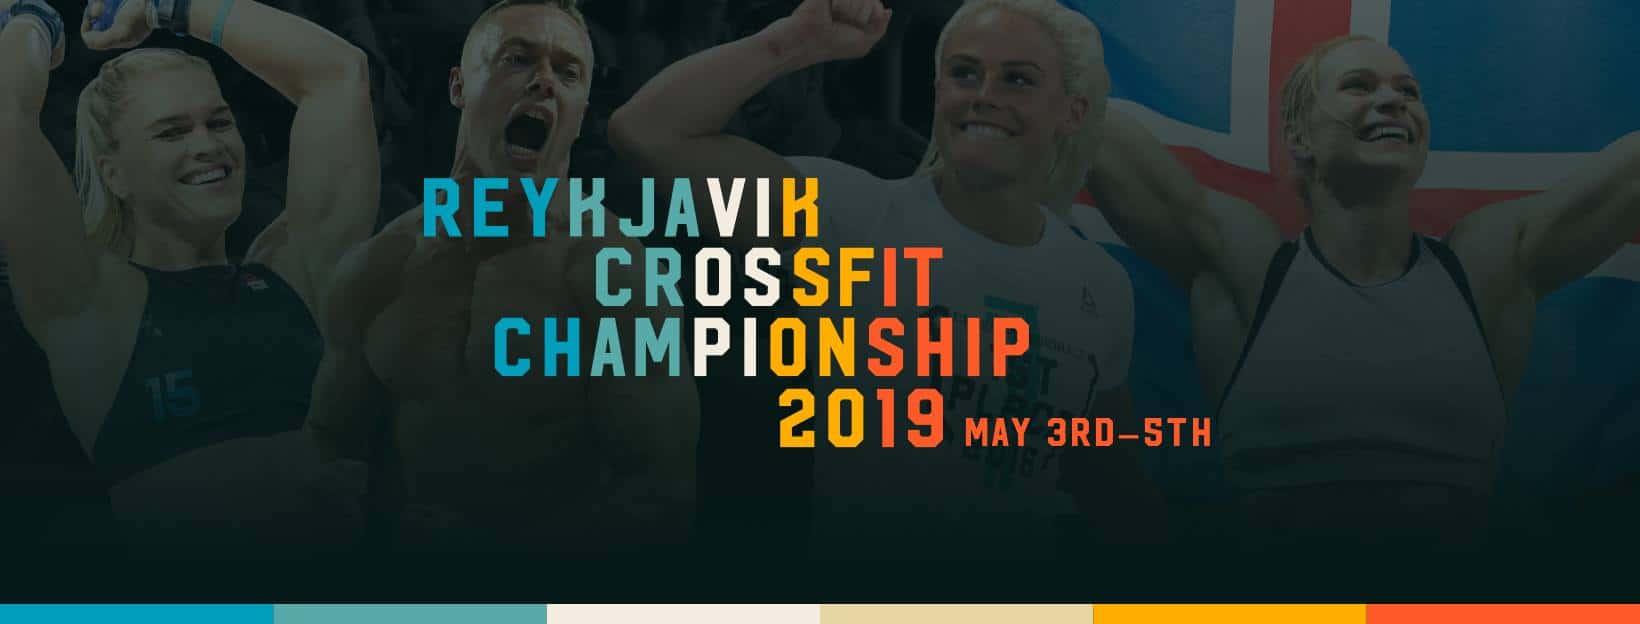 Reykjavik CrossFit Championship 2019